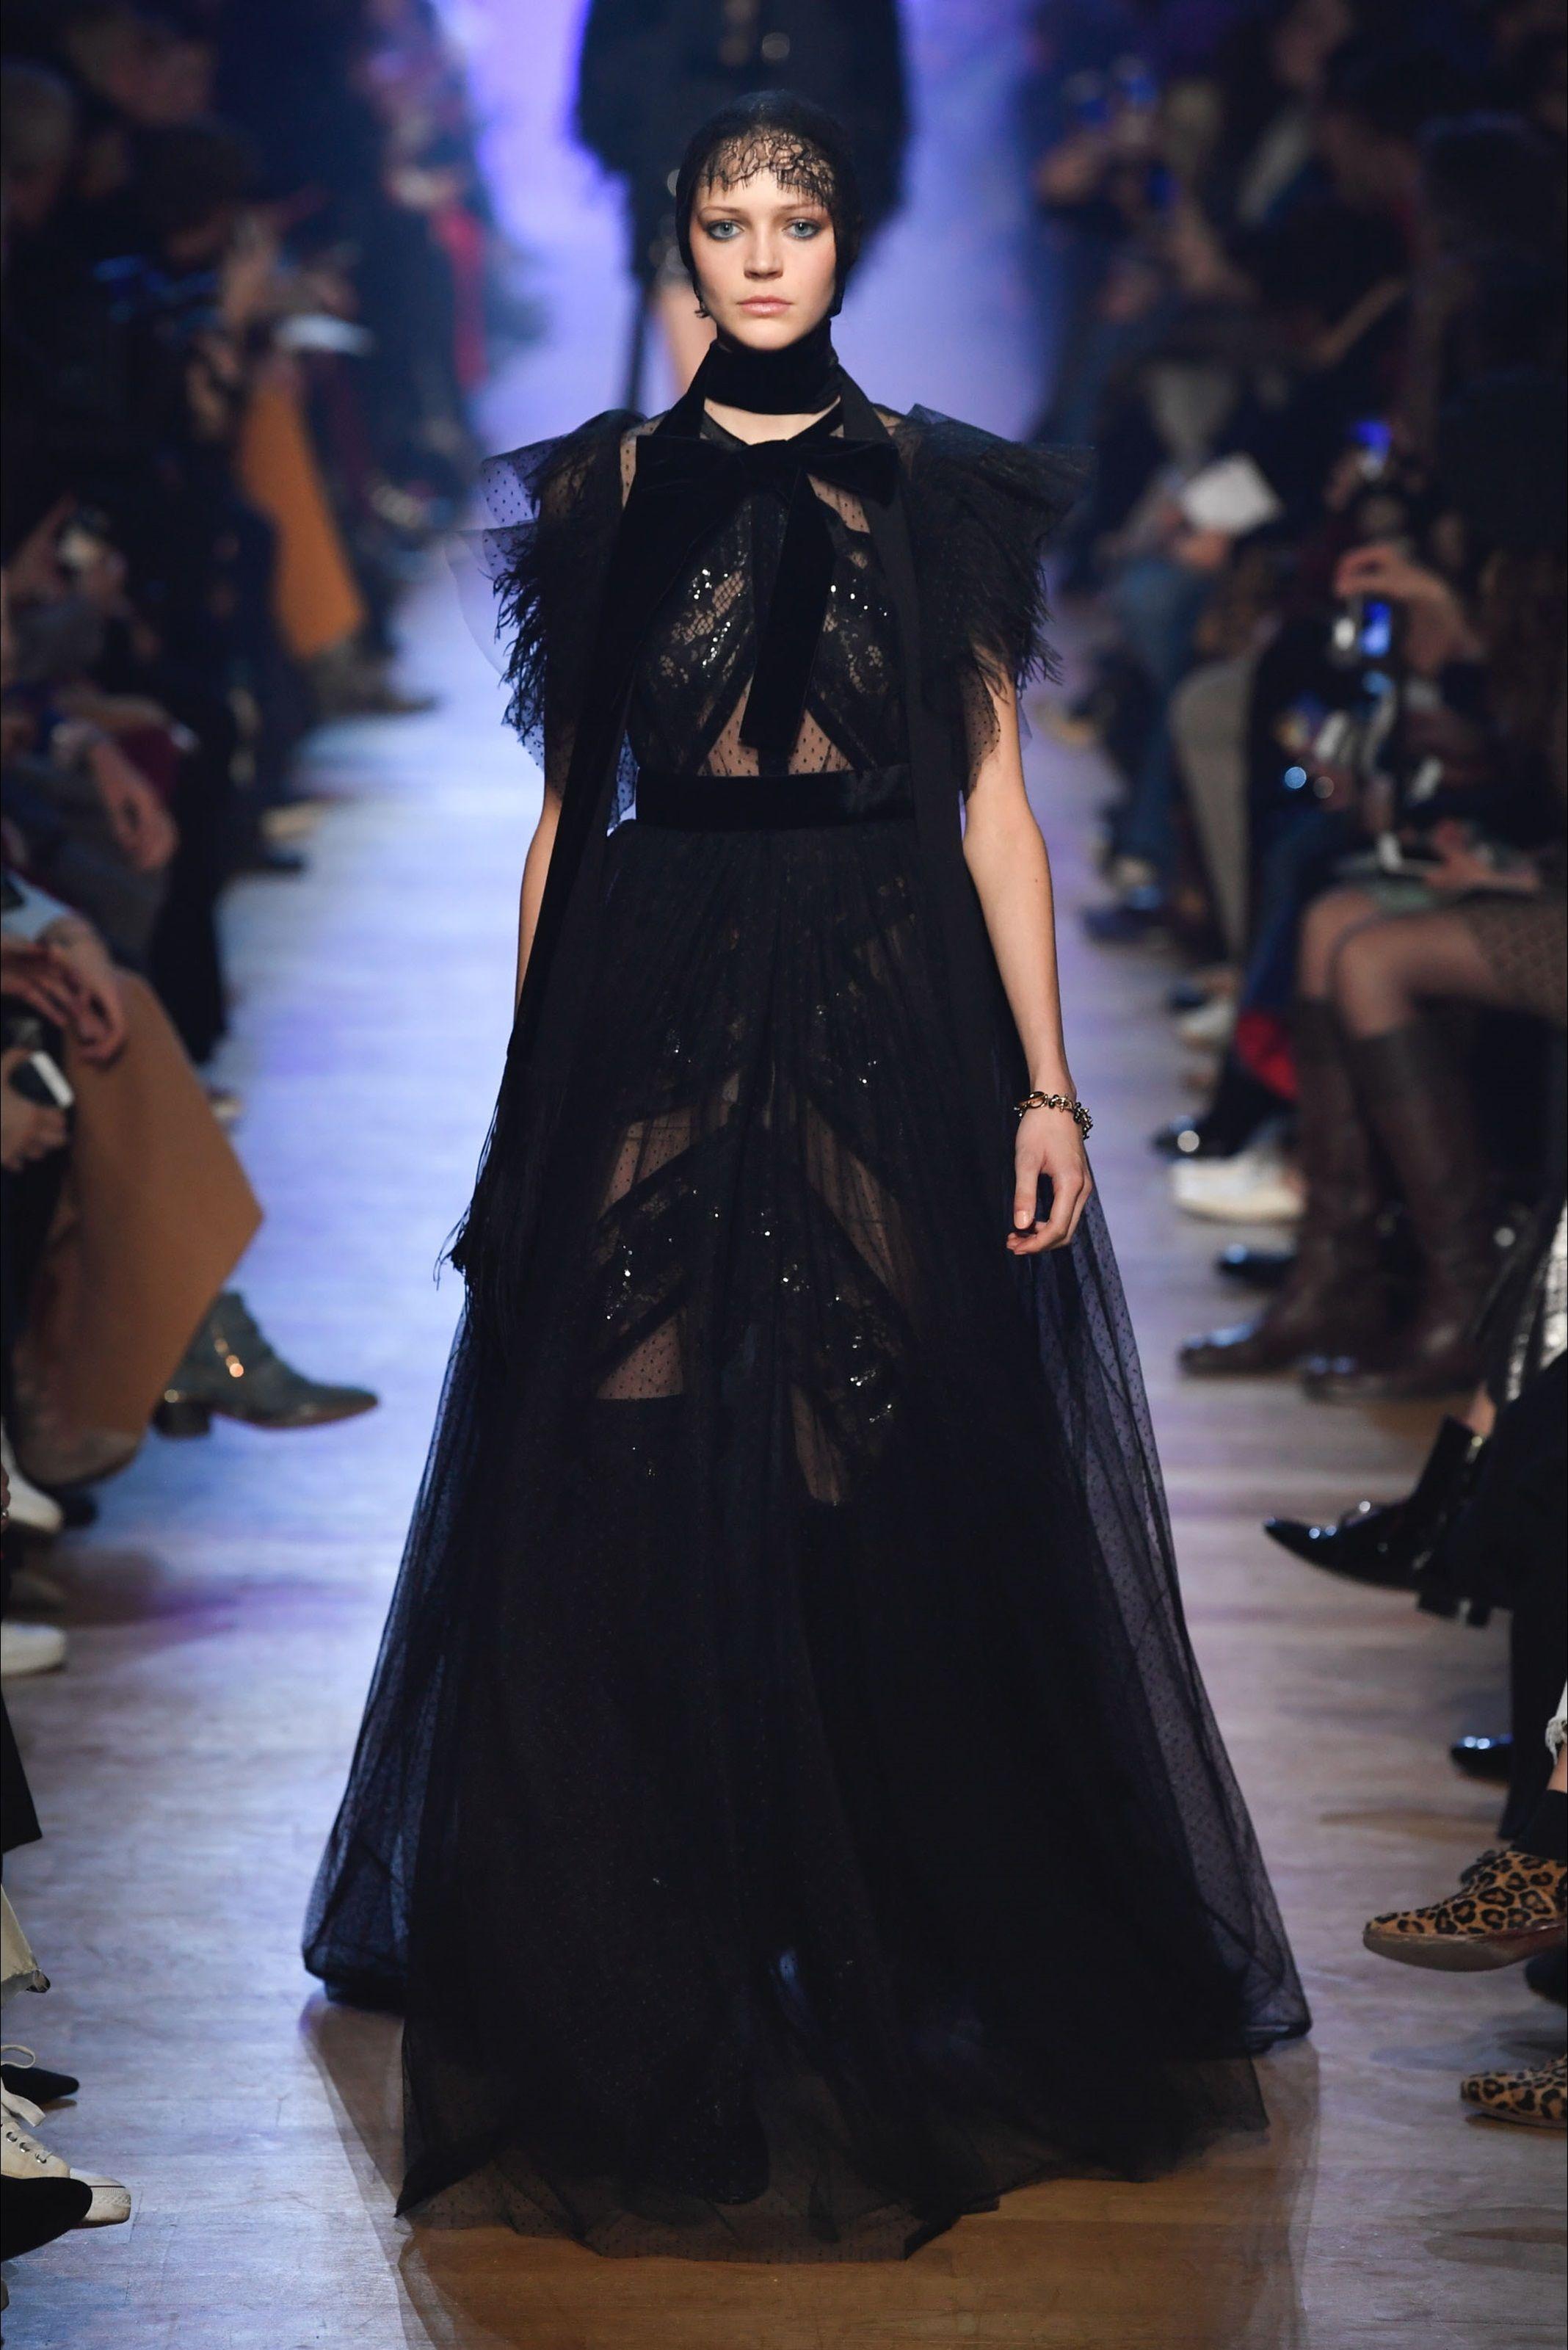 58d9c1a54ebf Sfilata Elie Saab Parigi - Collezioni Autunno Inverno 2018-19 - Vogue